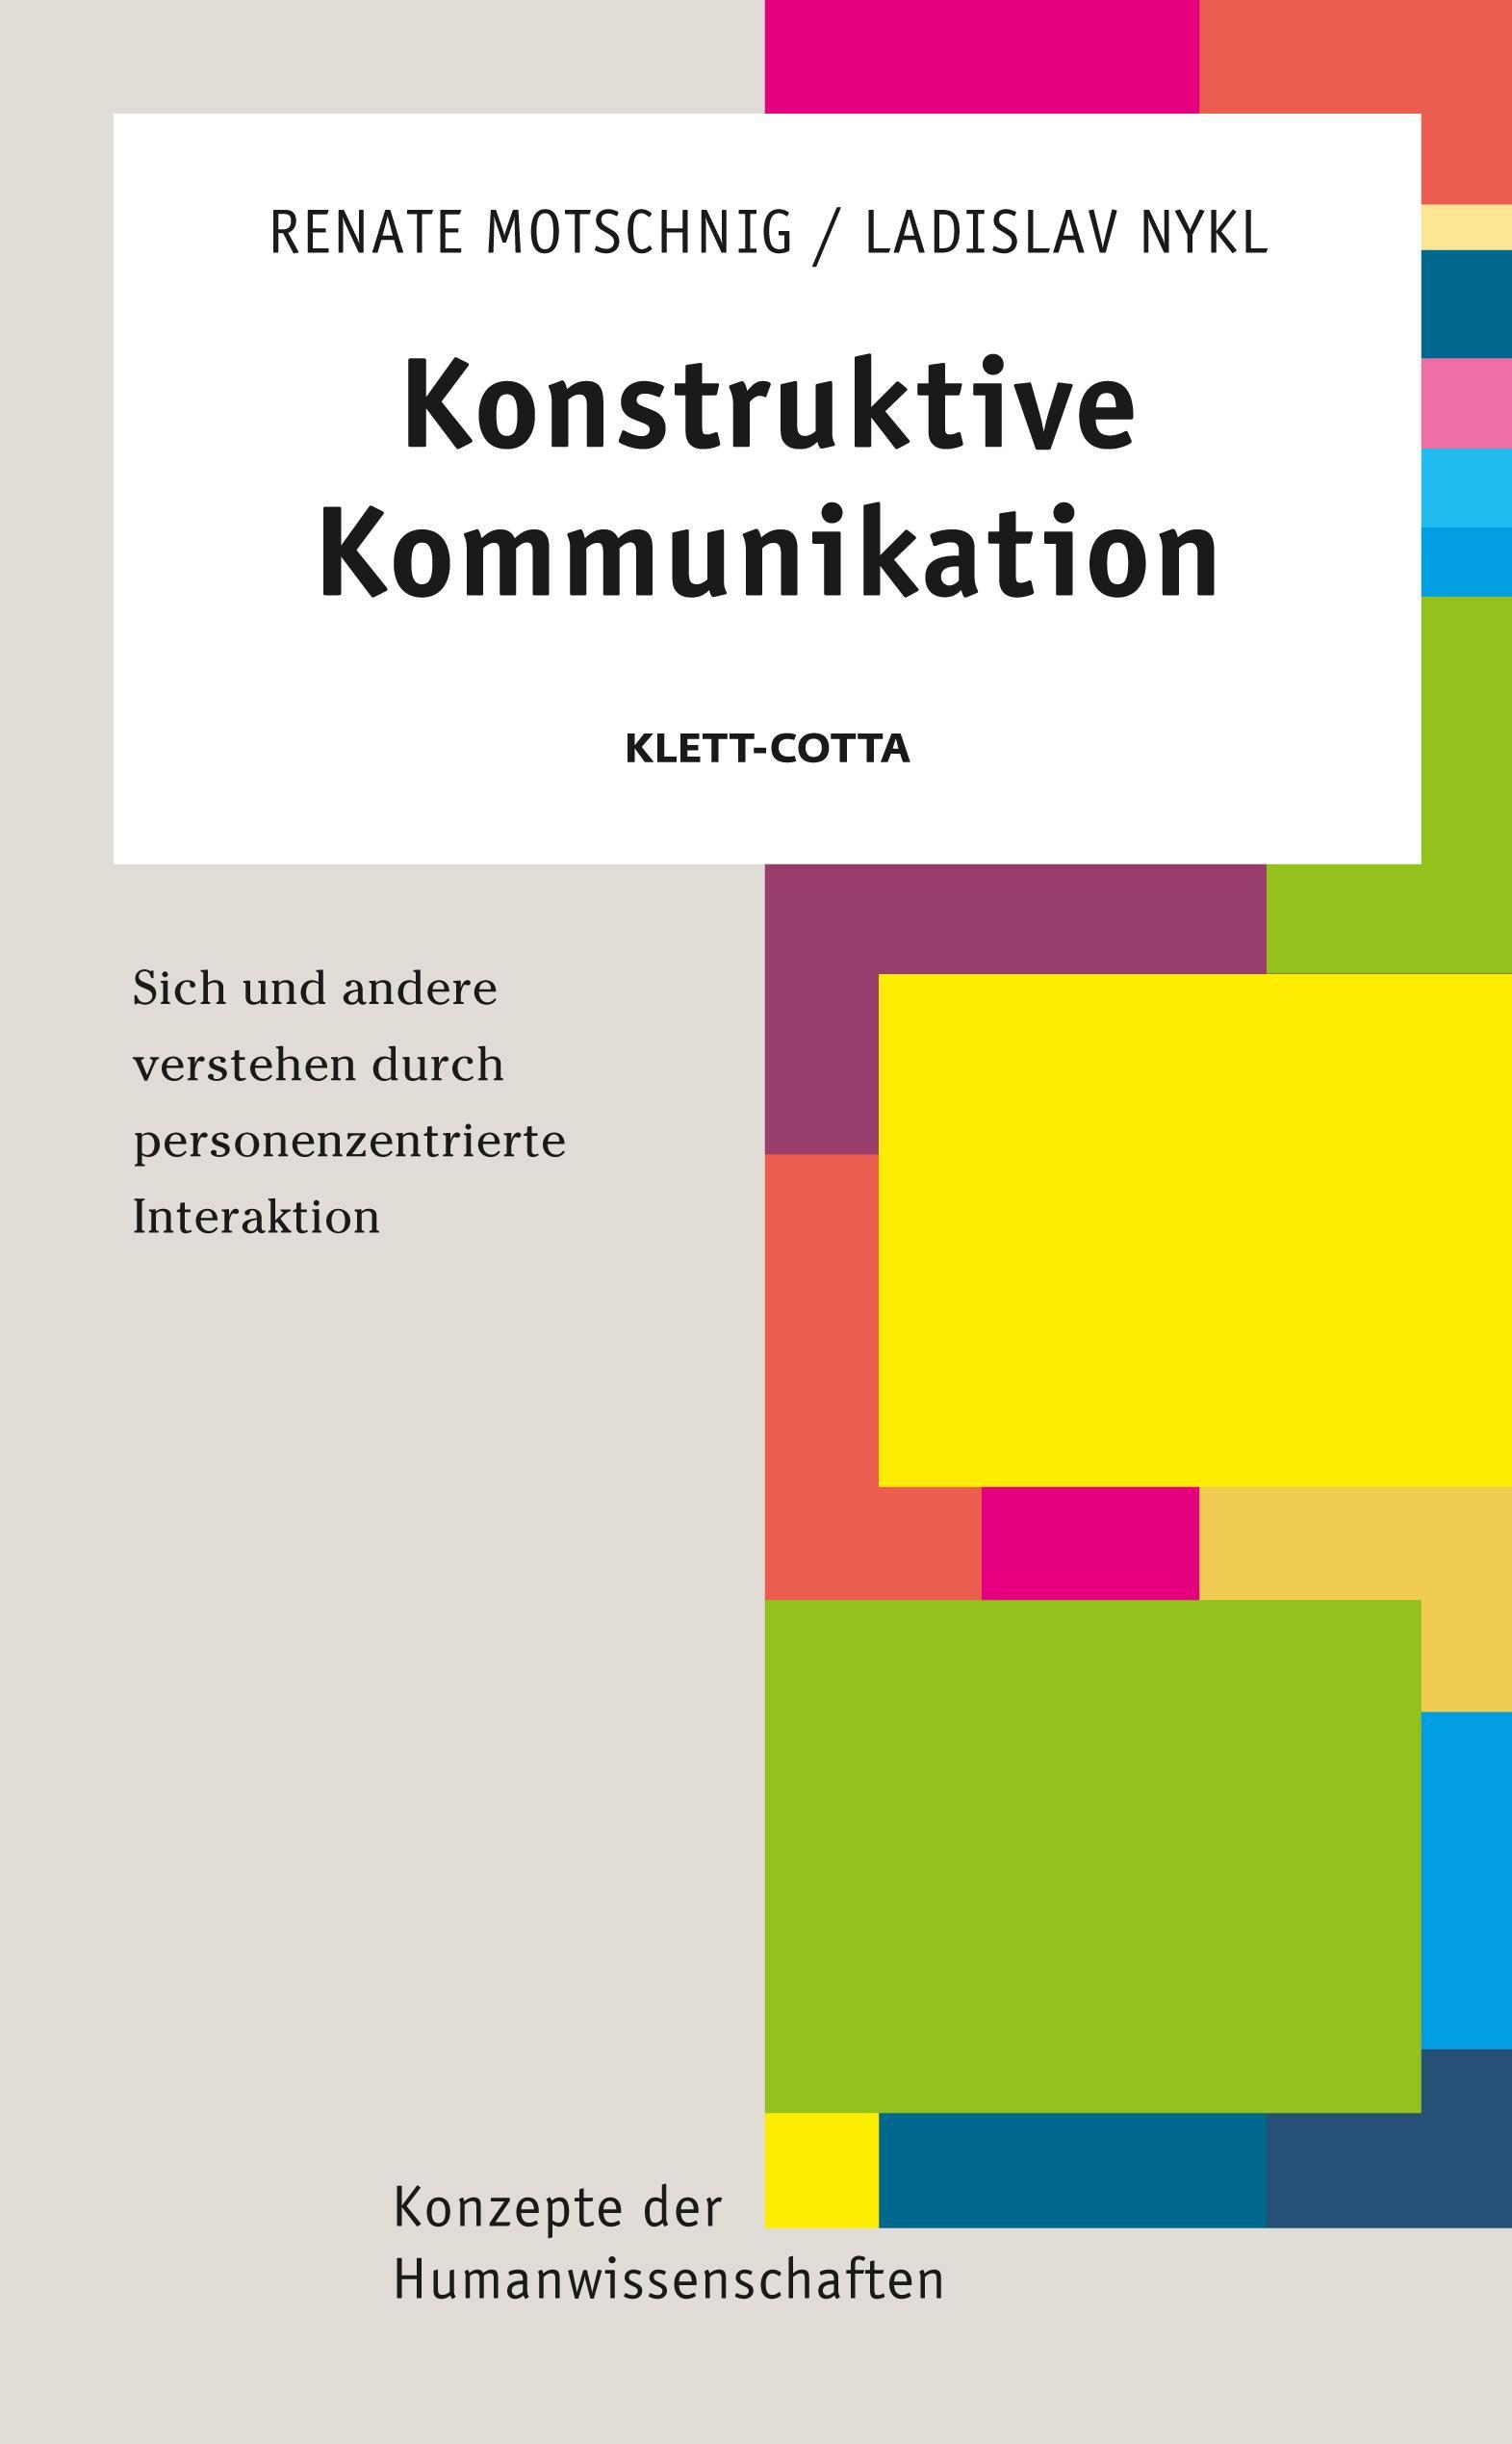 Konstruktive Kommunikation Renate Motschnig